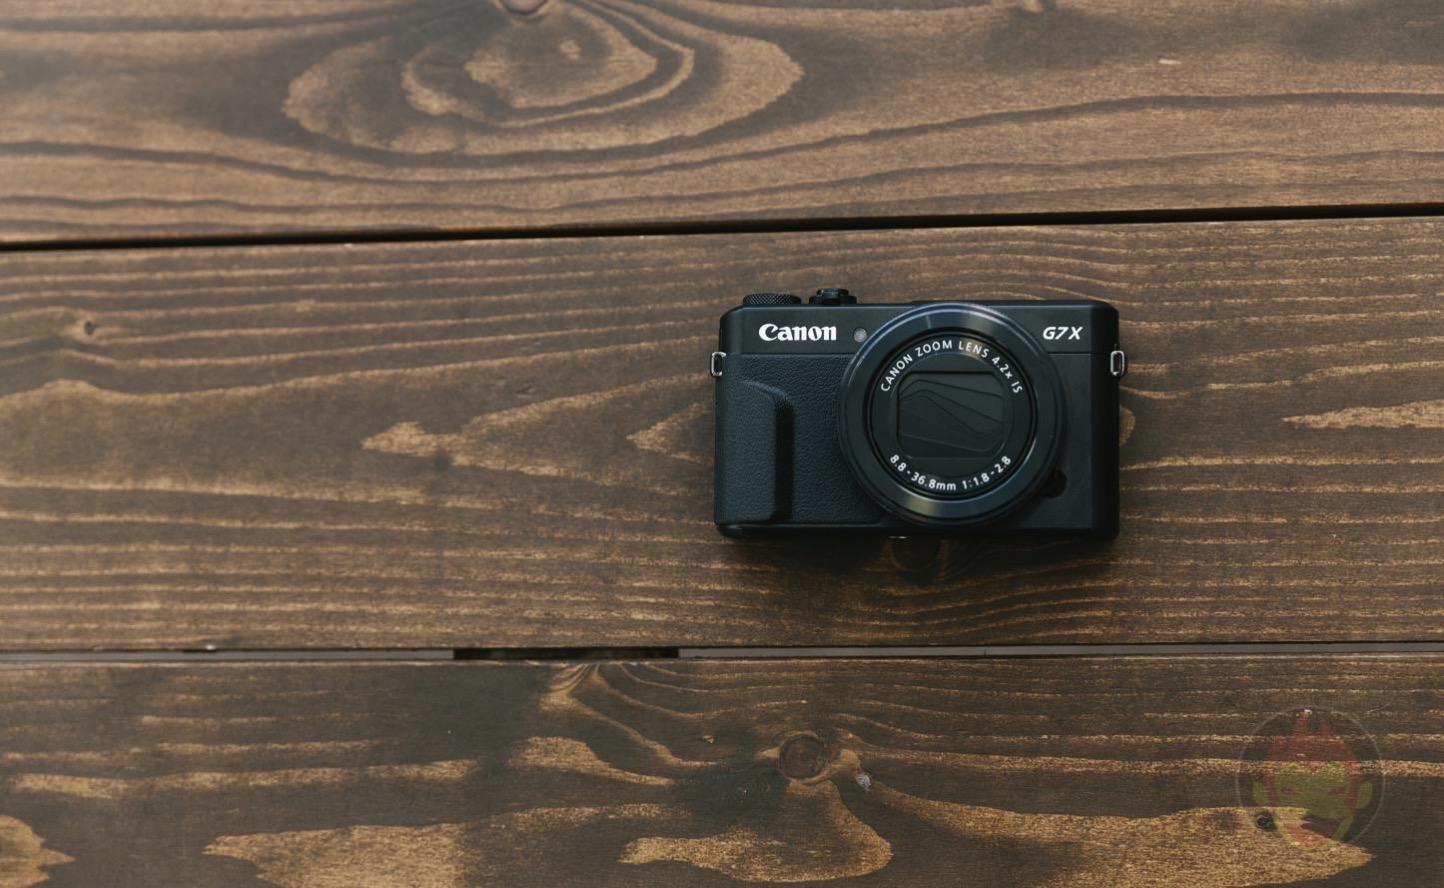 Canon-PowerShot-G7-Mark2-Review-05.jpg